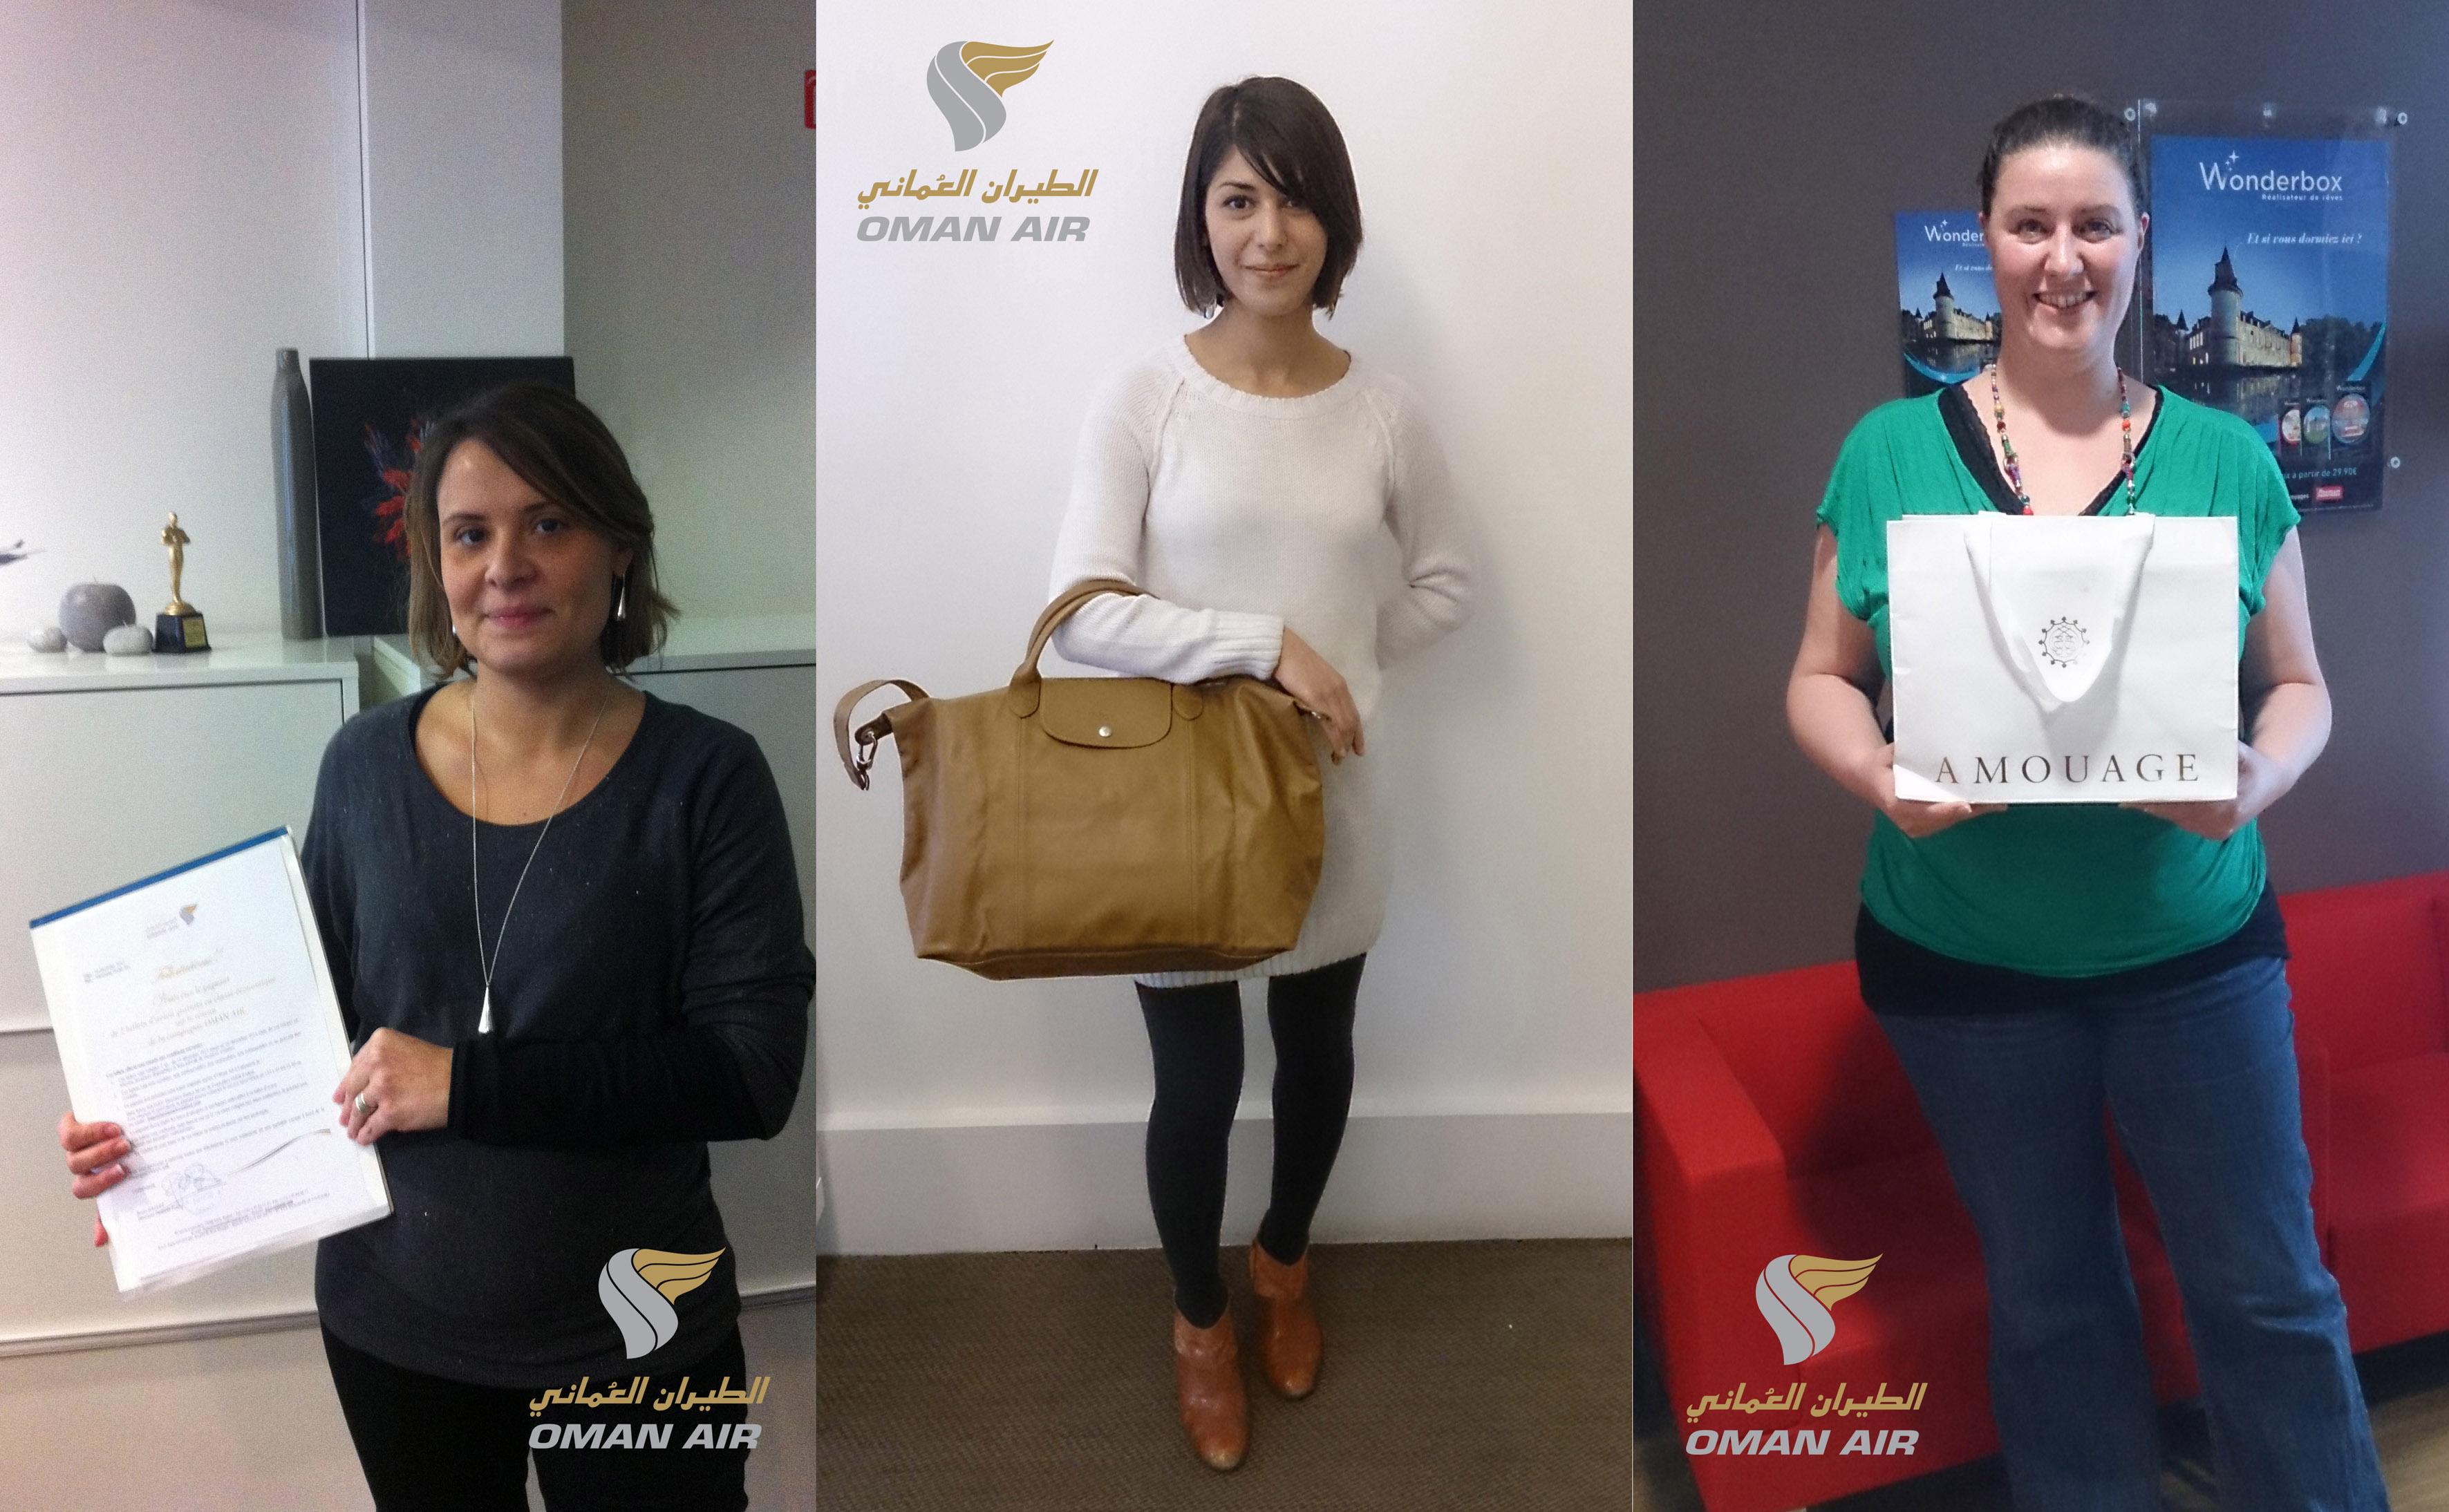 Lydia Marques, Melody Ajir et Rachel Sultan sont les 3 gagnantes de l'elearning Oman Air - DR